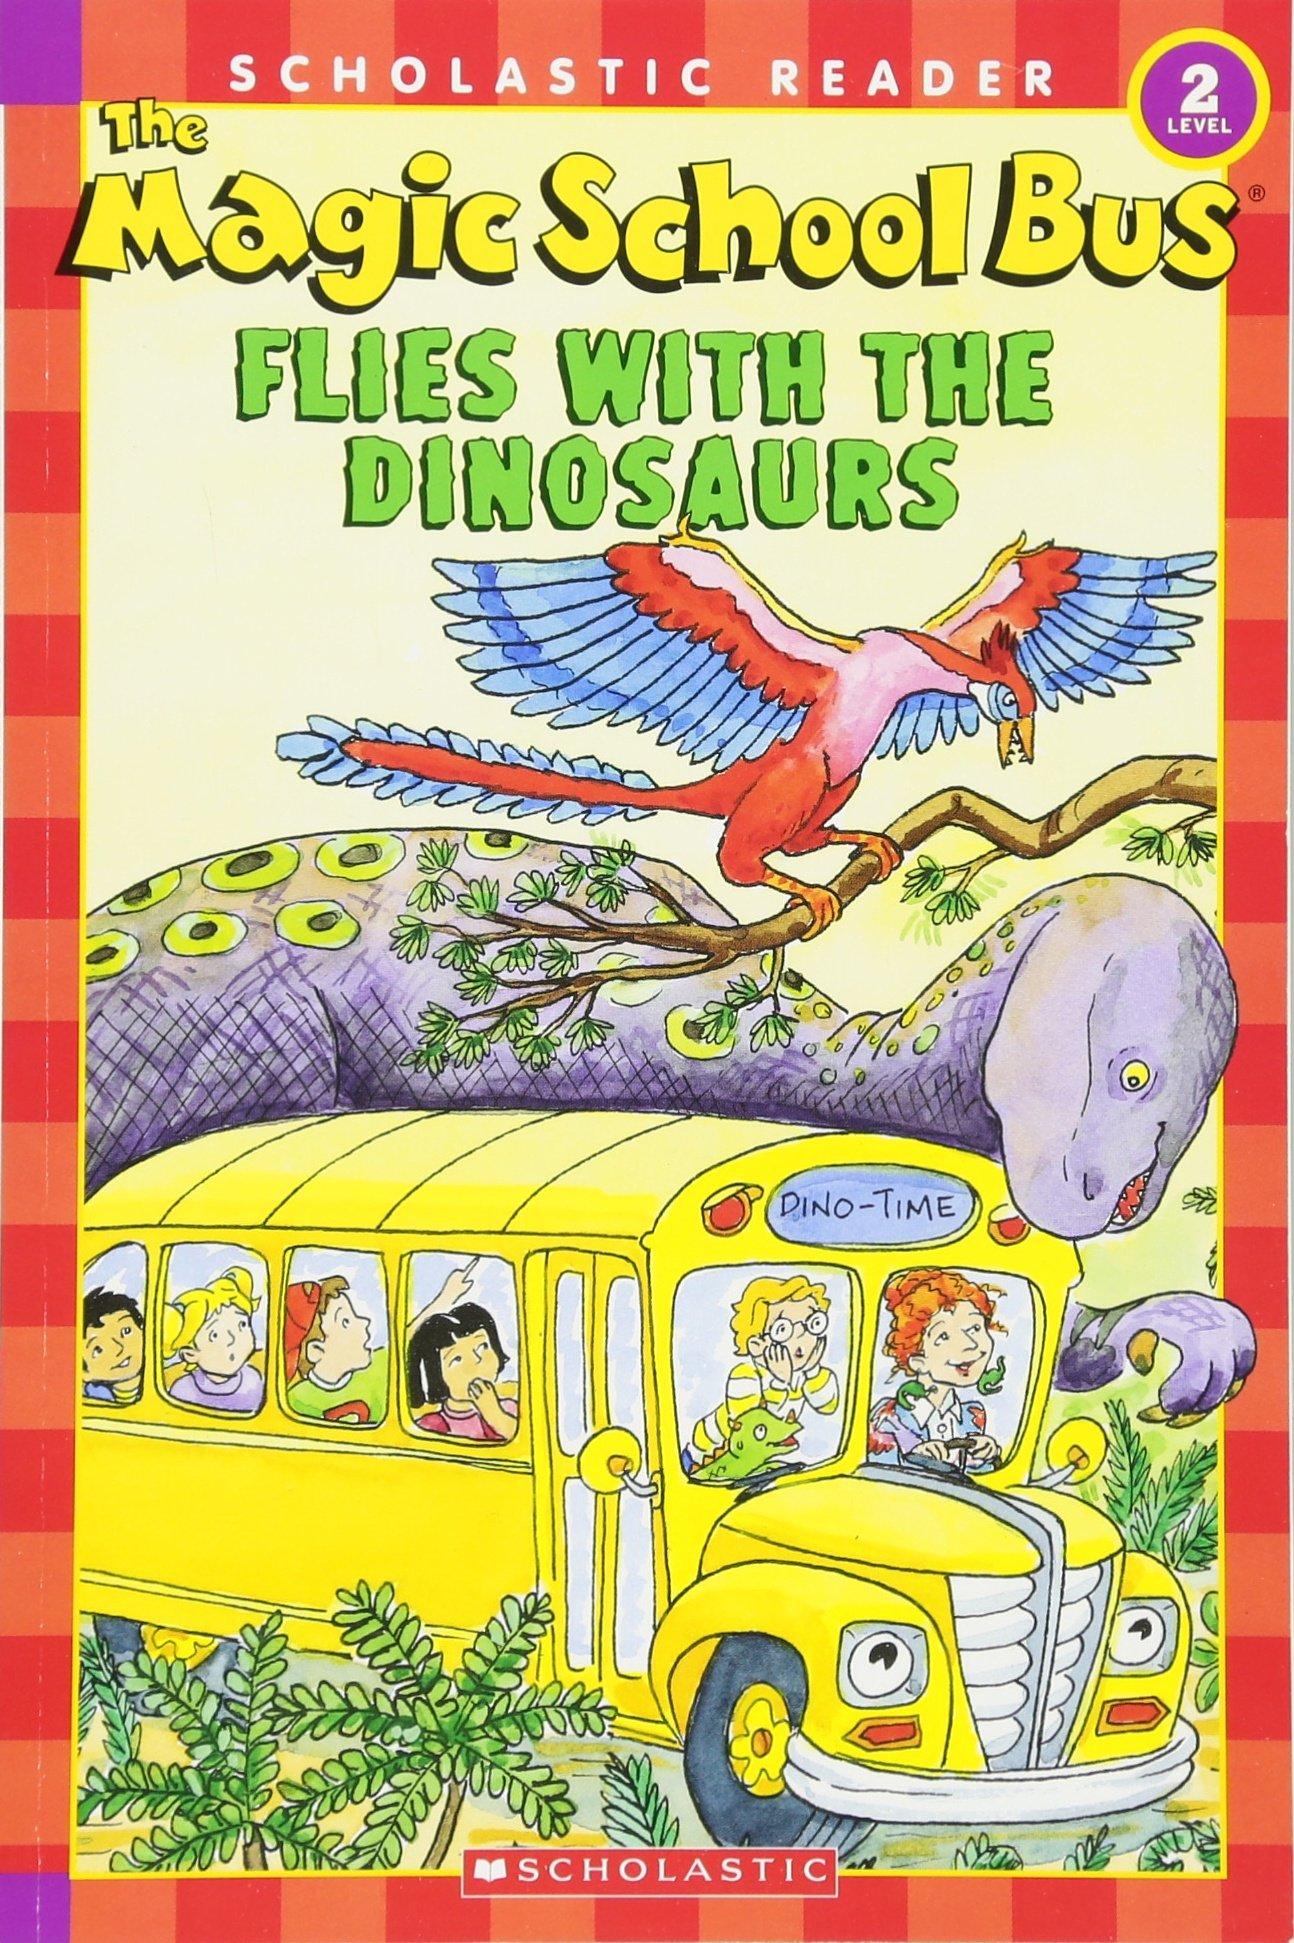 magic school bus dinosaurs game download